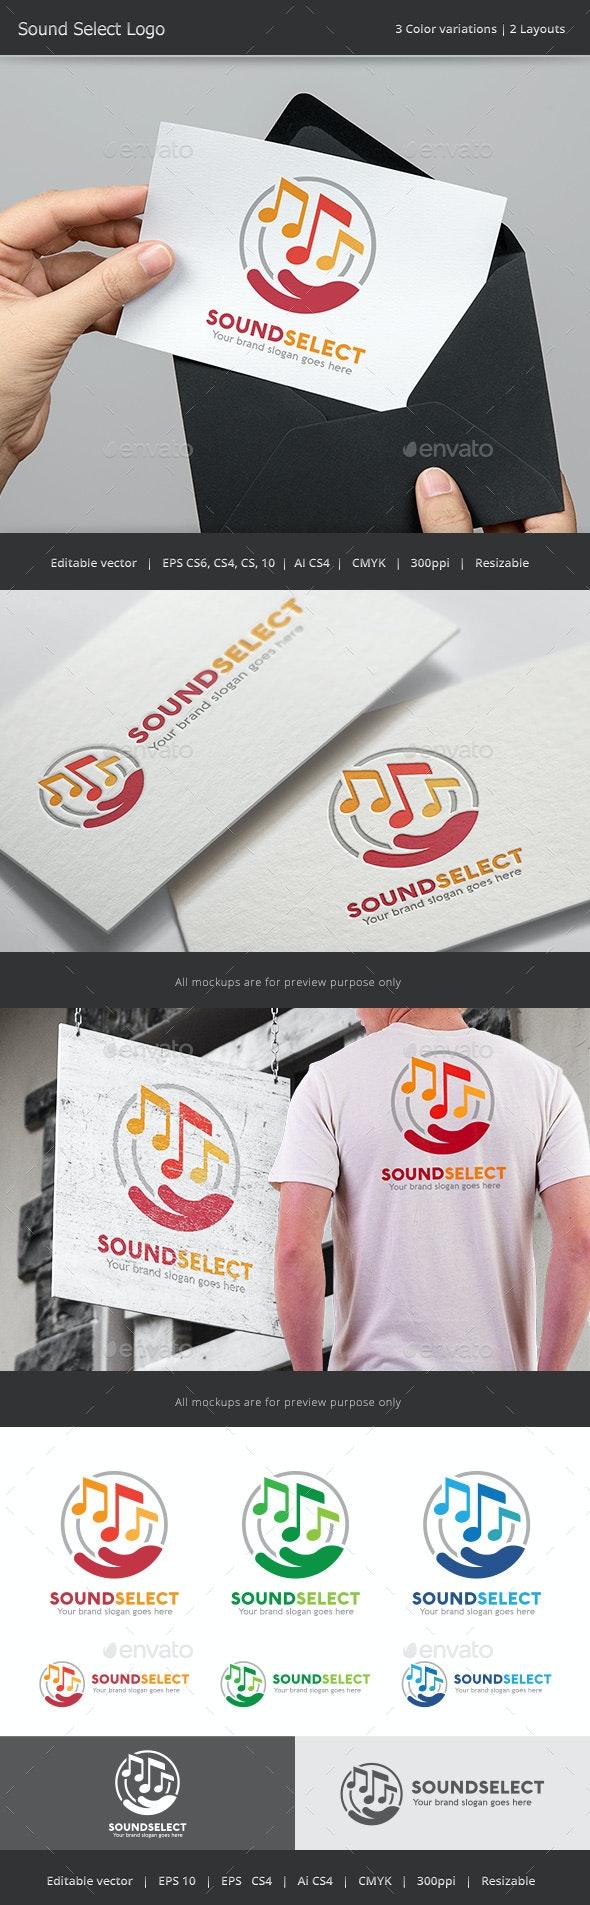 Sound Select Logo